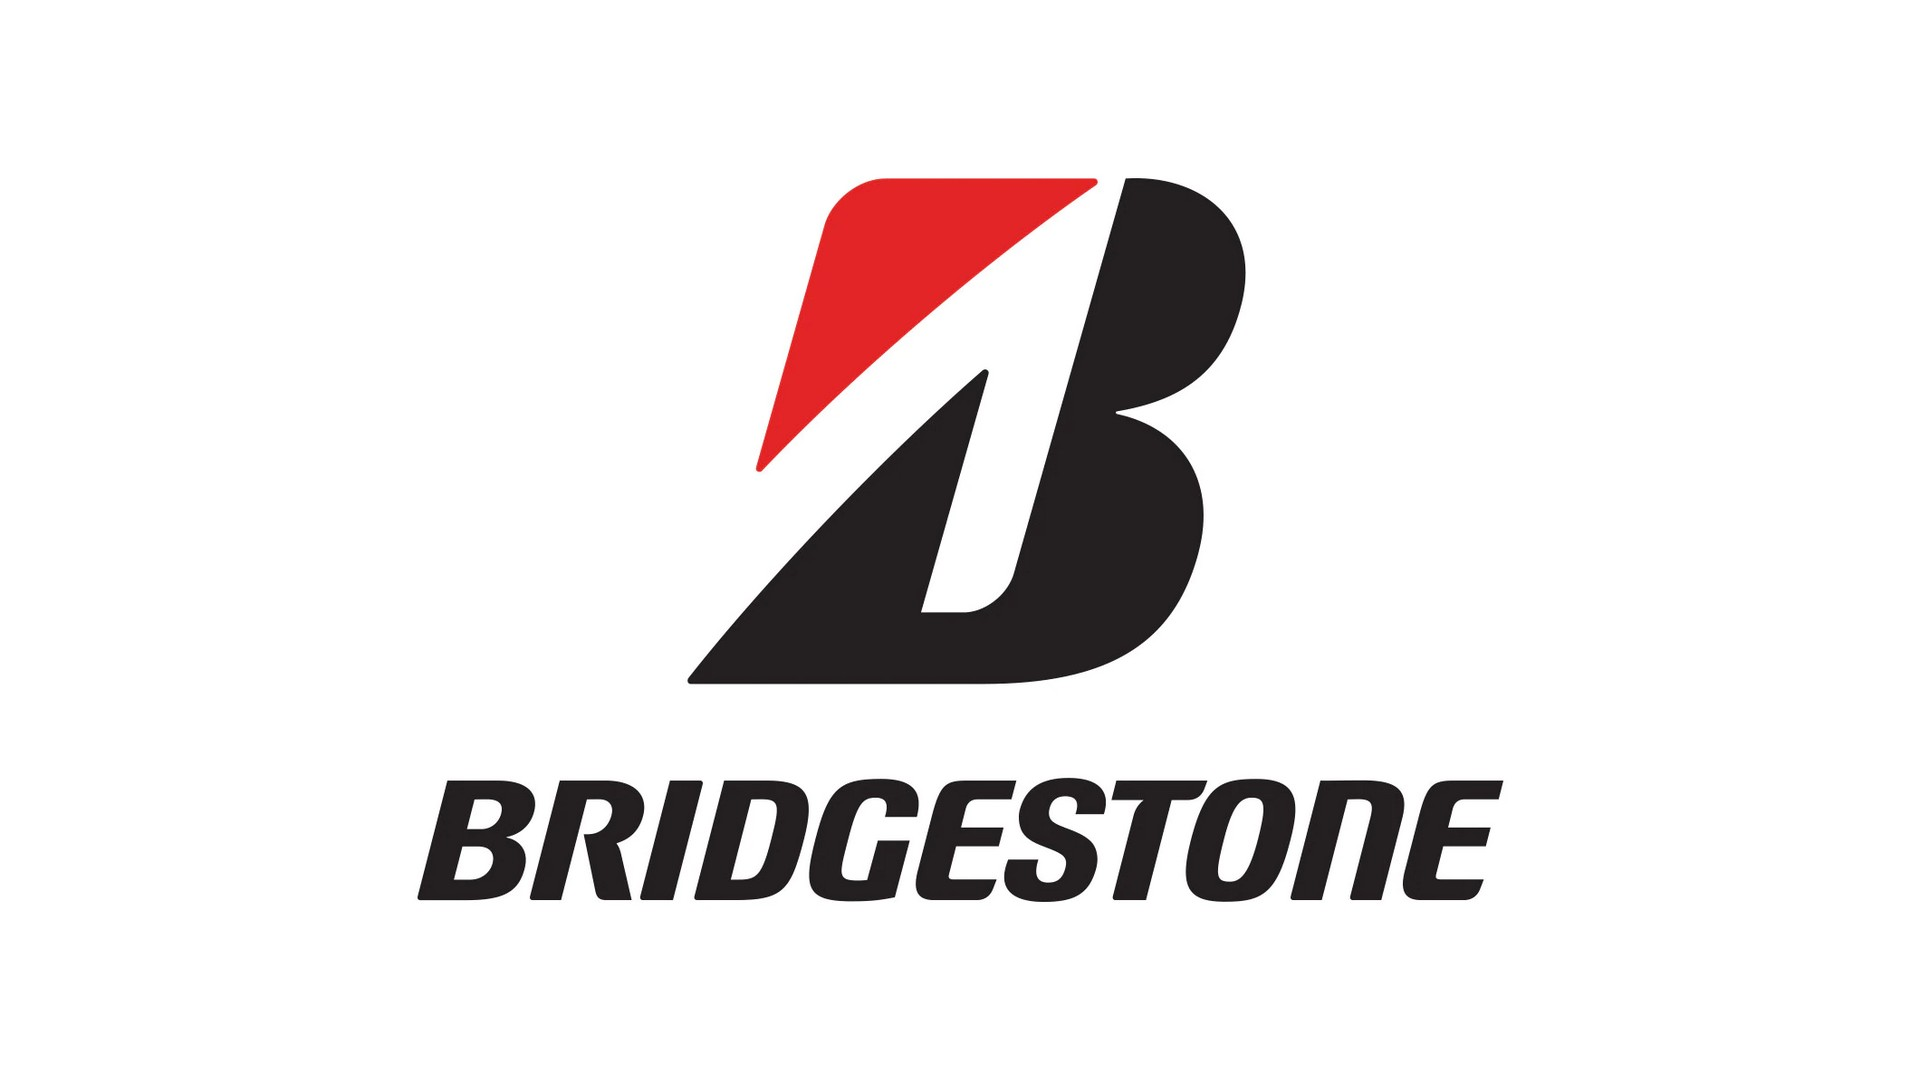 Bridgestone (1) Logo